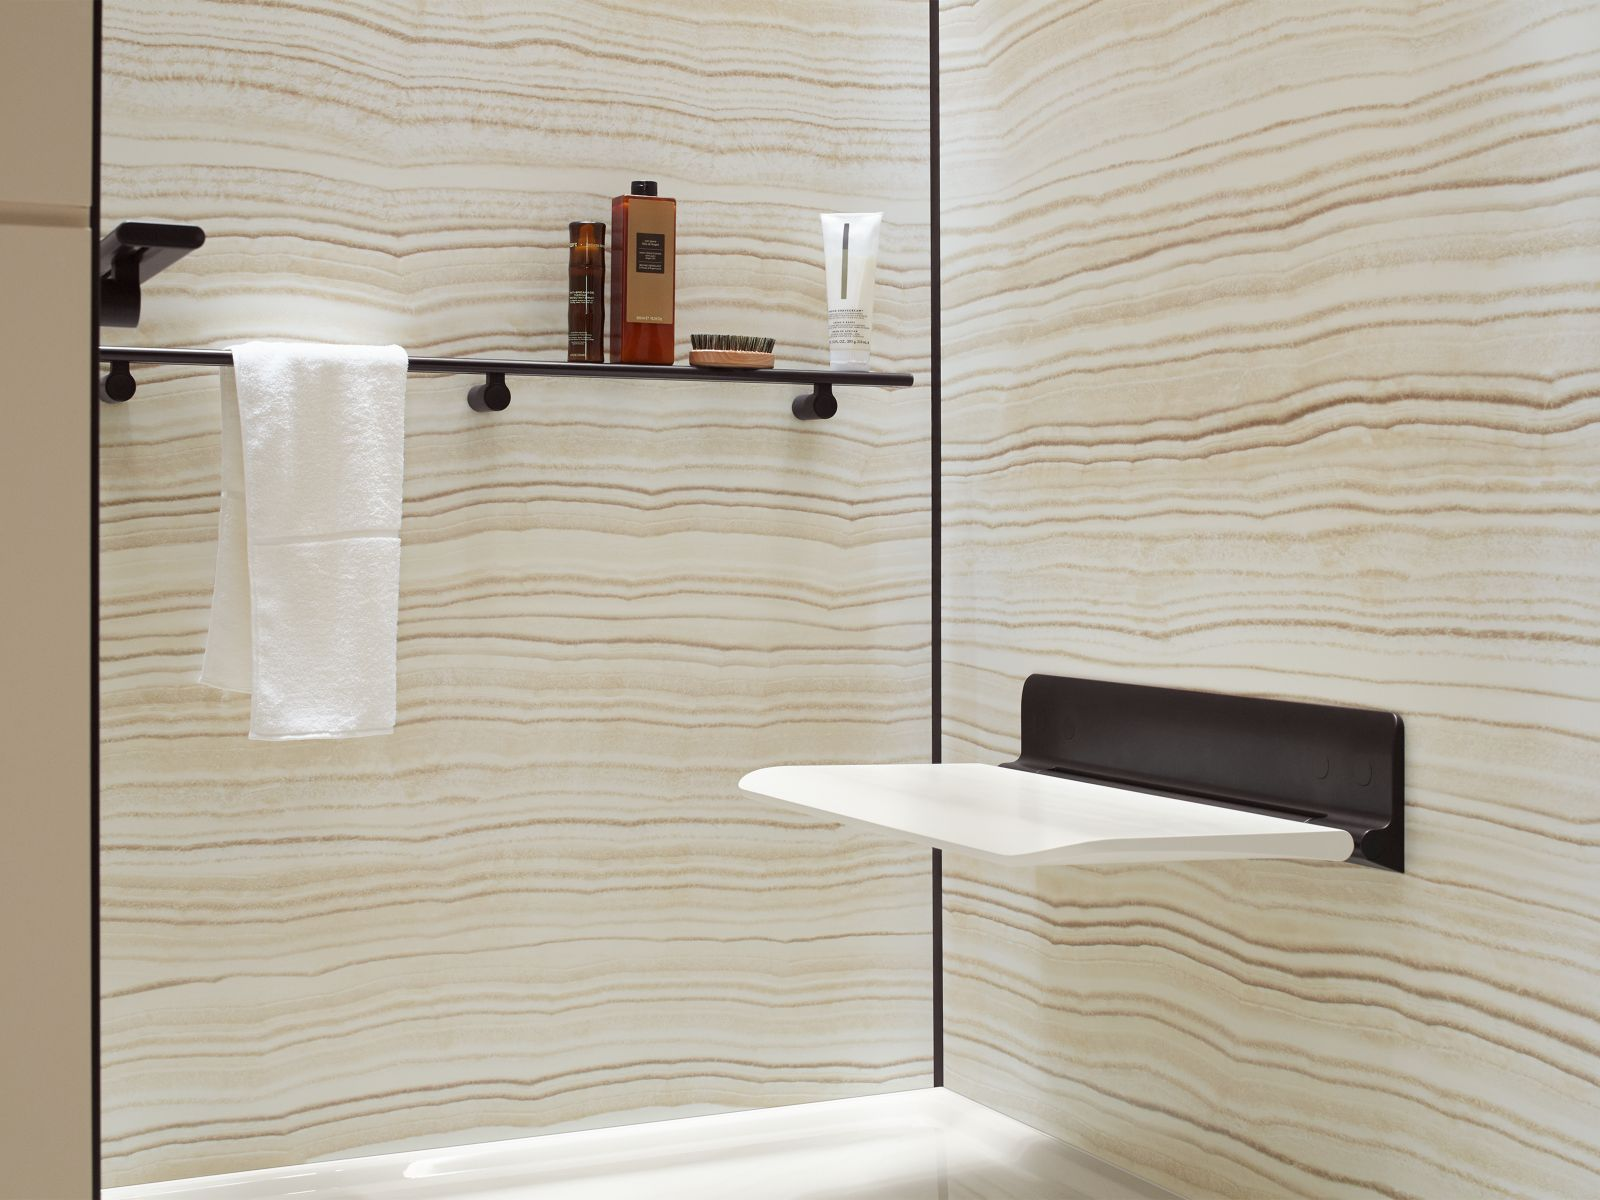 Standard plumbing supply product kohler choreograph k 97603 0 48 quot x 96 quot wall panel white